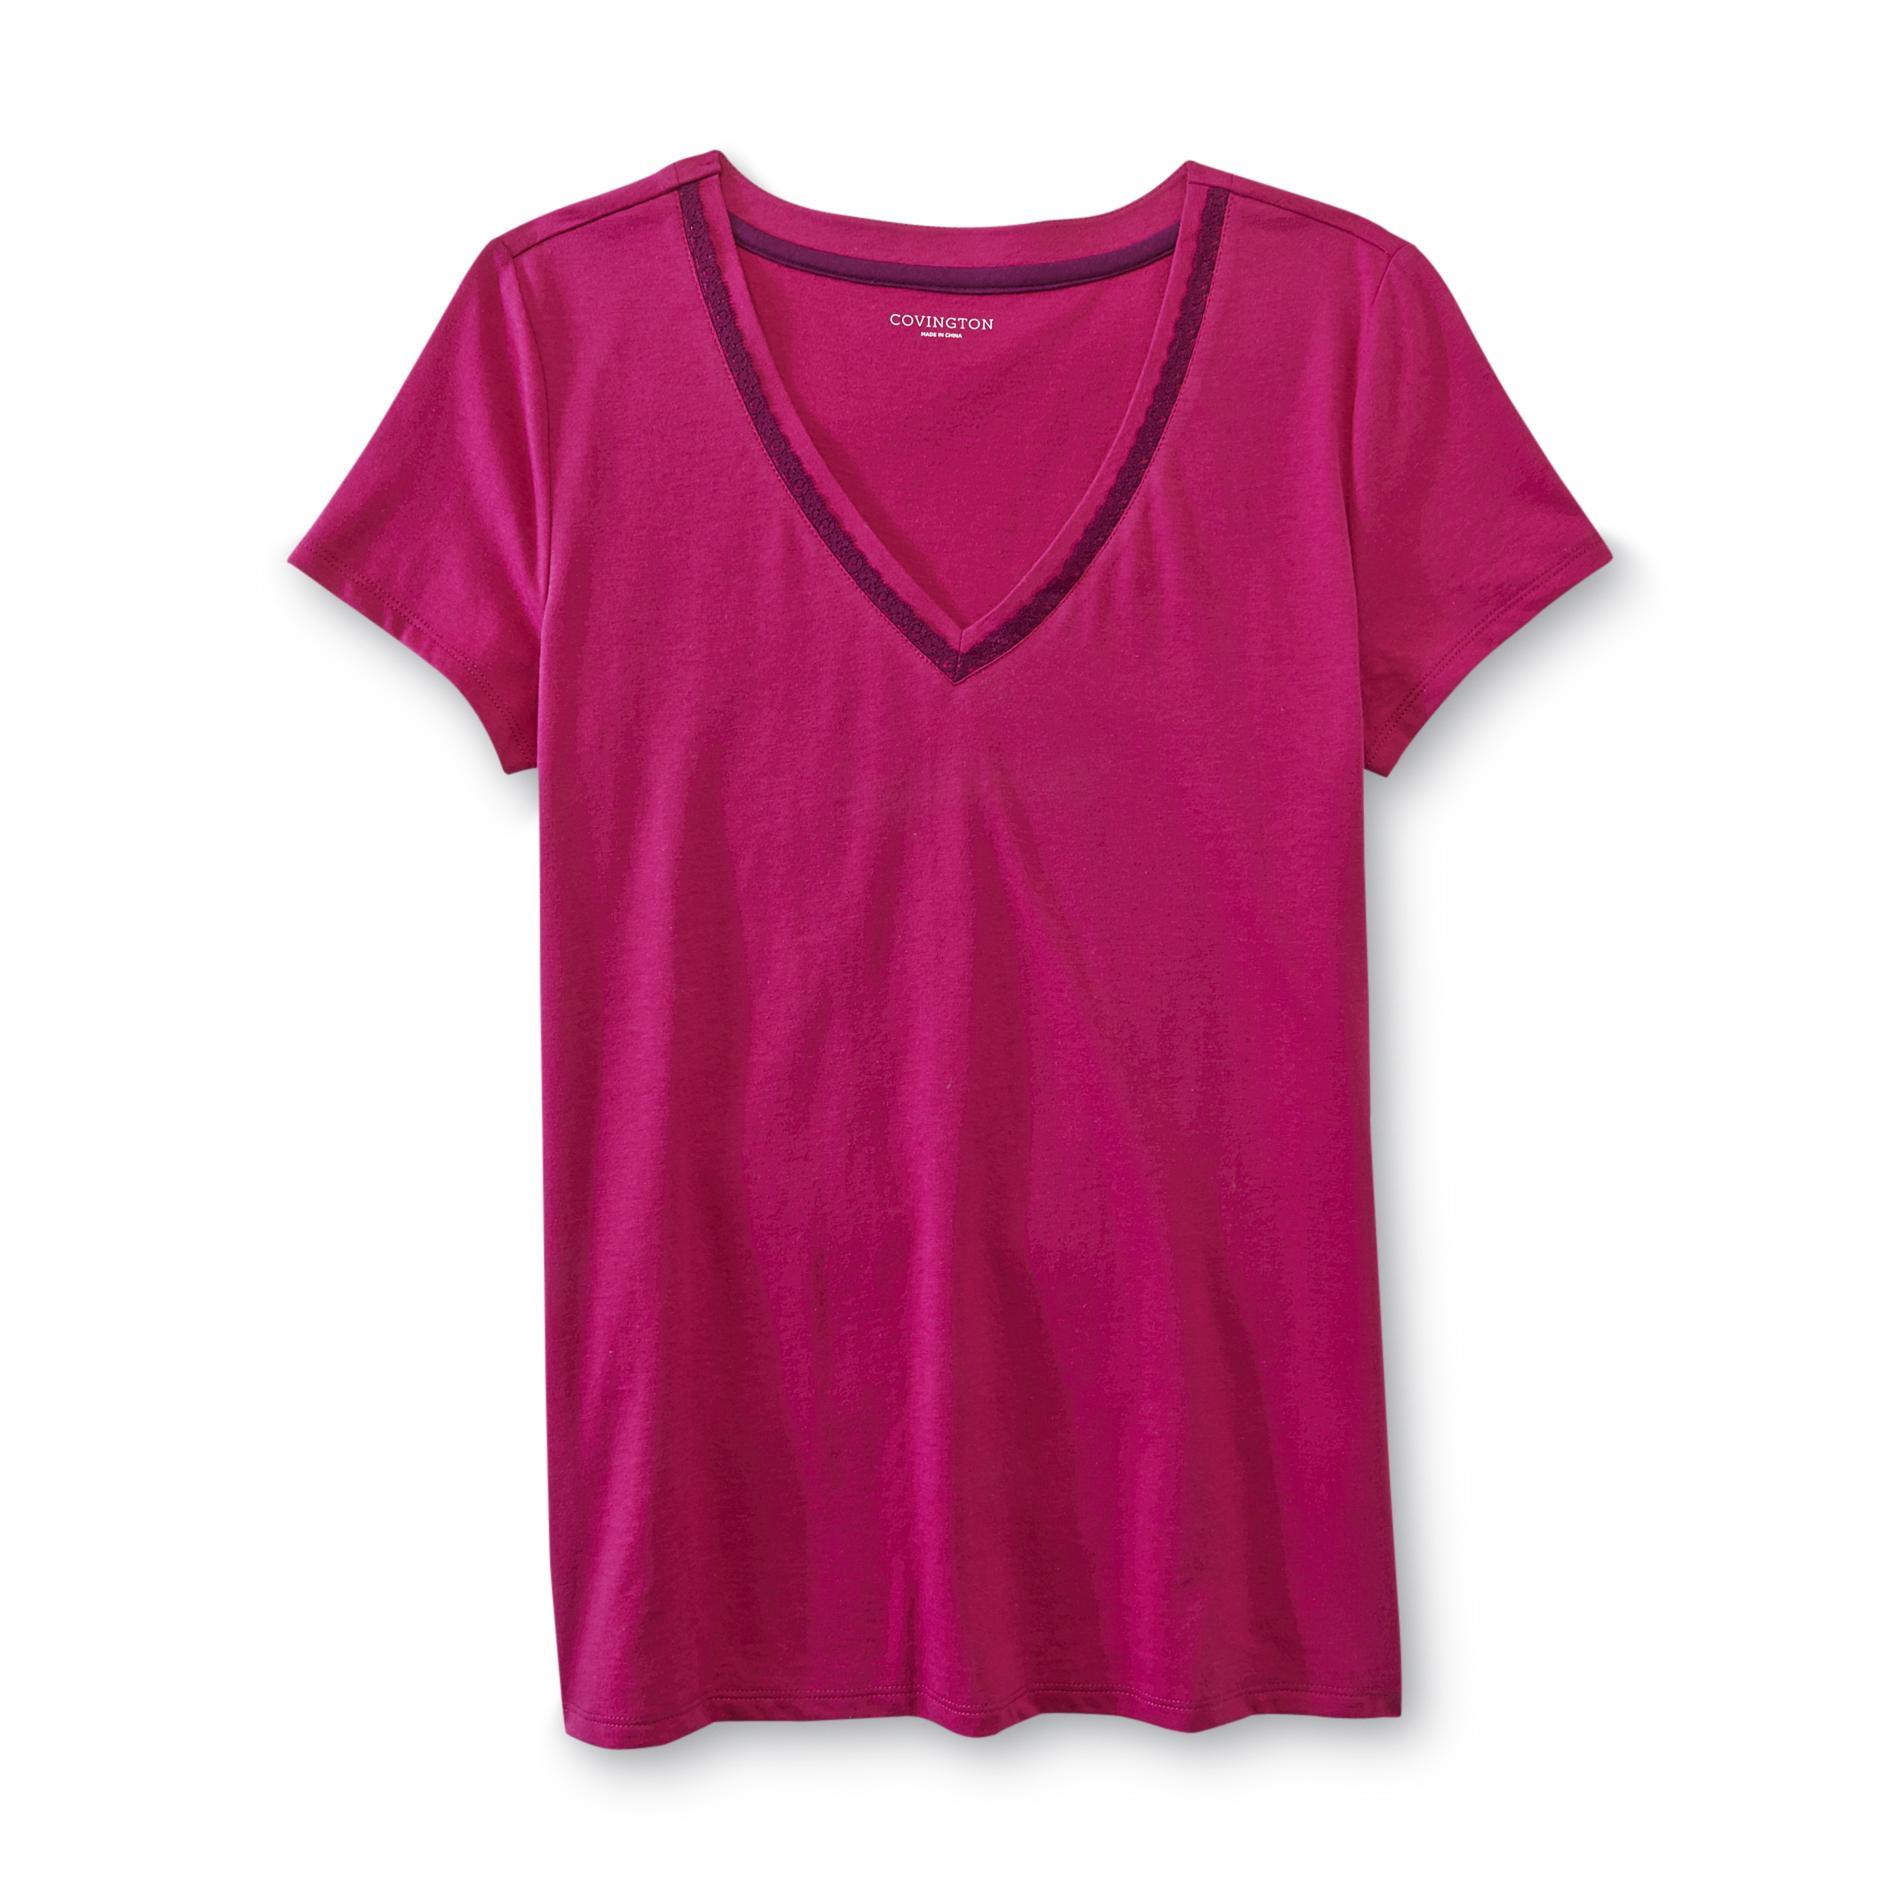 Covington Women's Lace-Trim Sleep T-Shirt at Sears.com